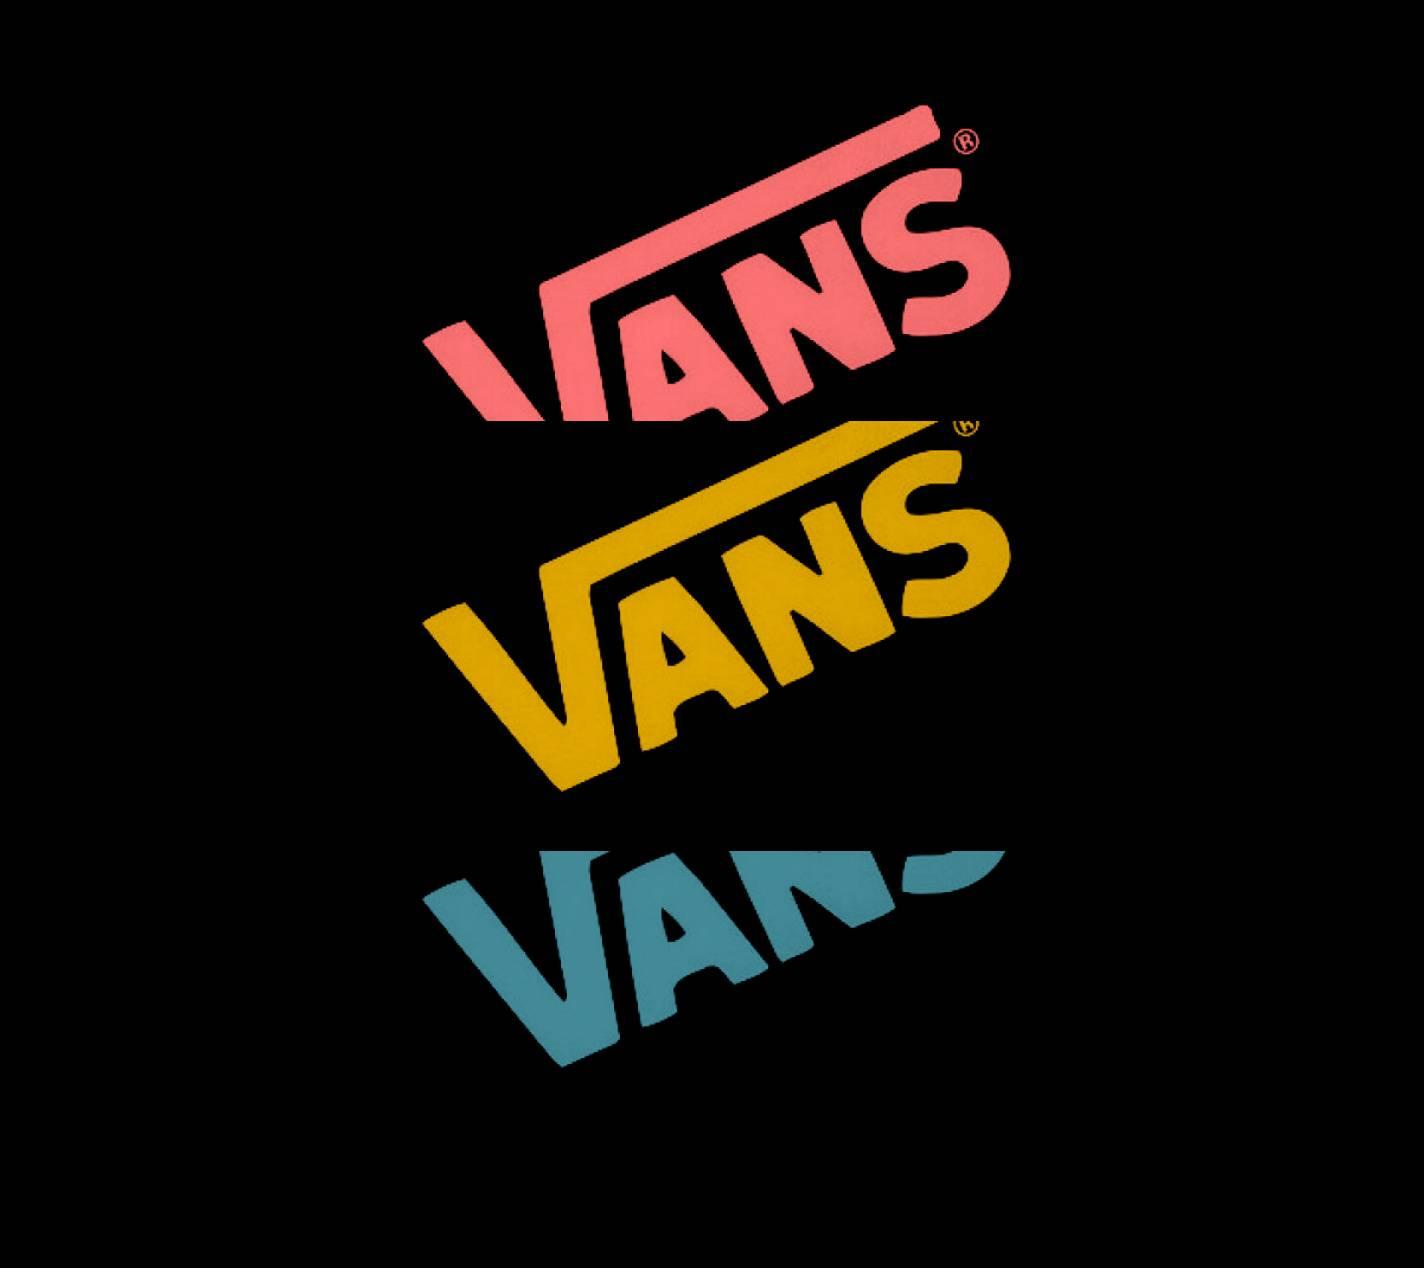 vans off the wall wallpaper